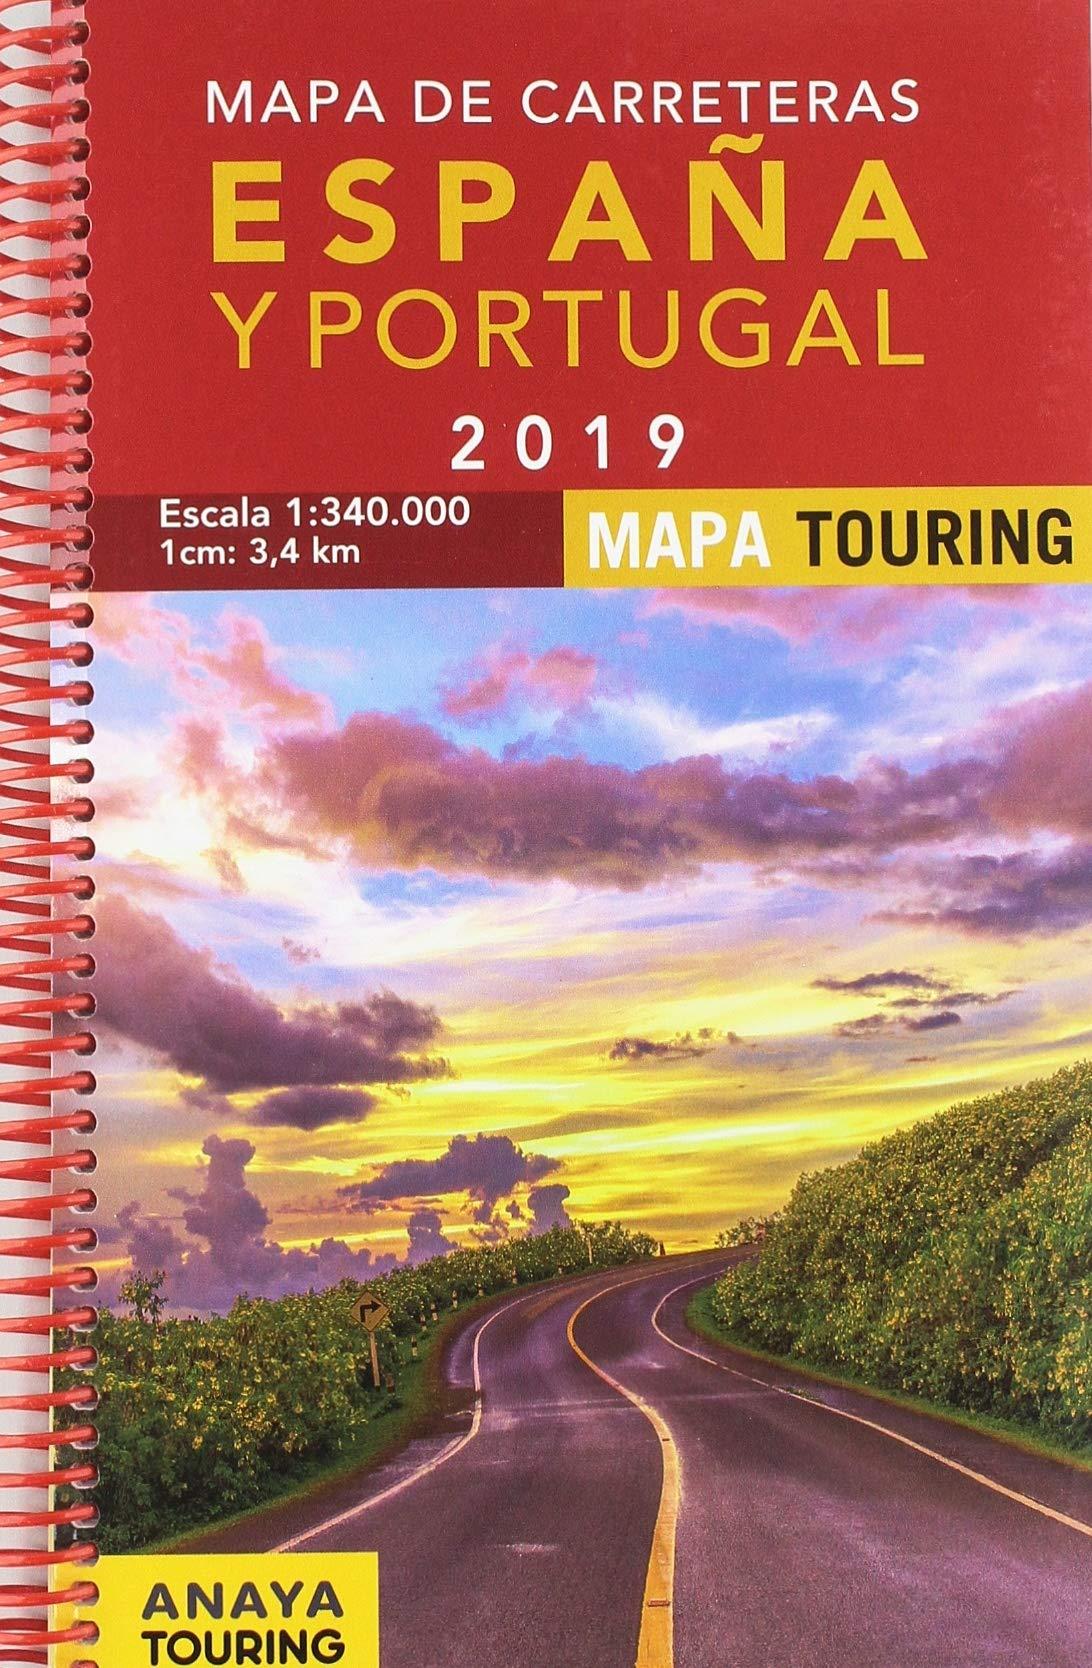 Mapa De Carreteras De Espana Y Portugal 1 340 000 2019